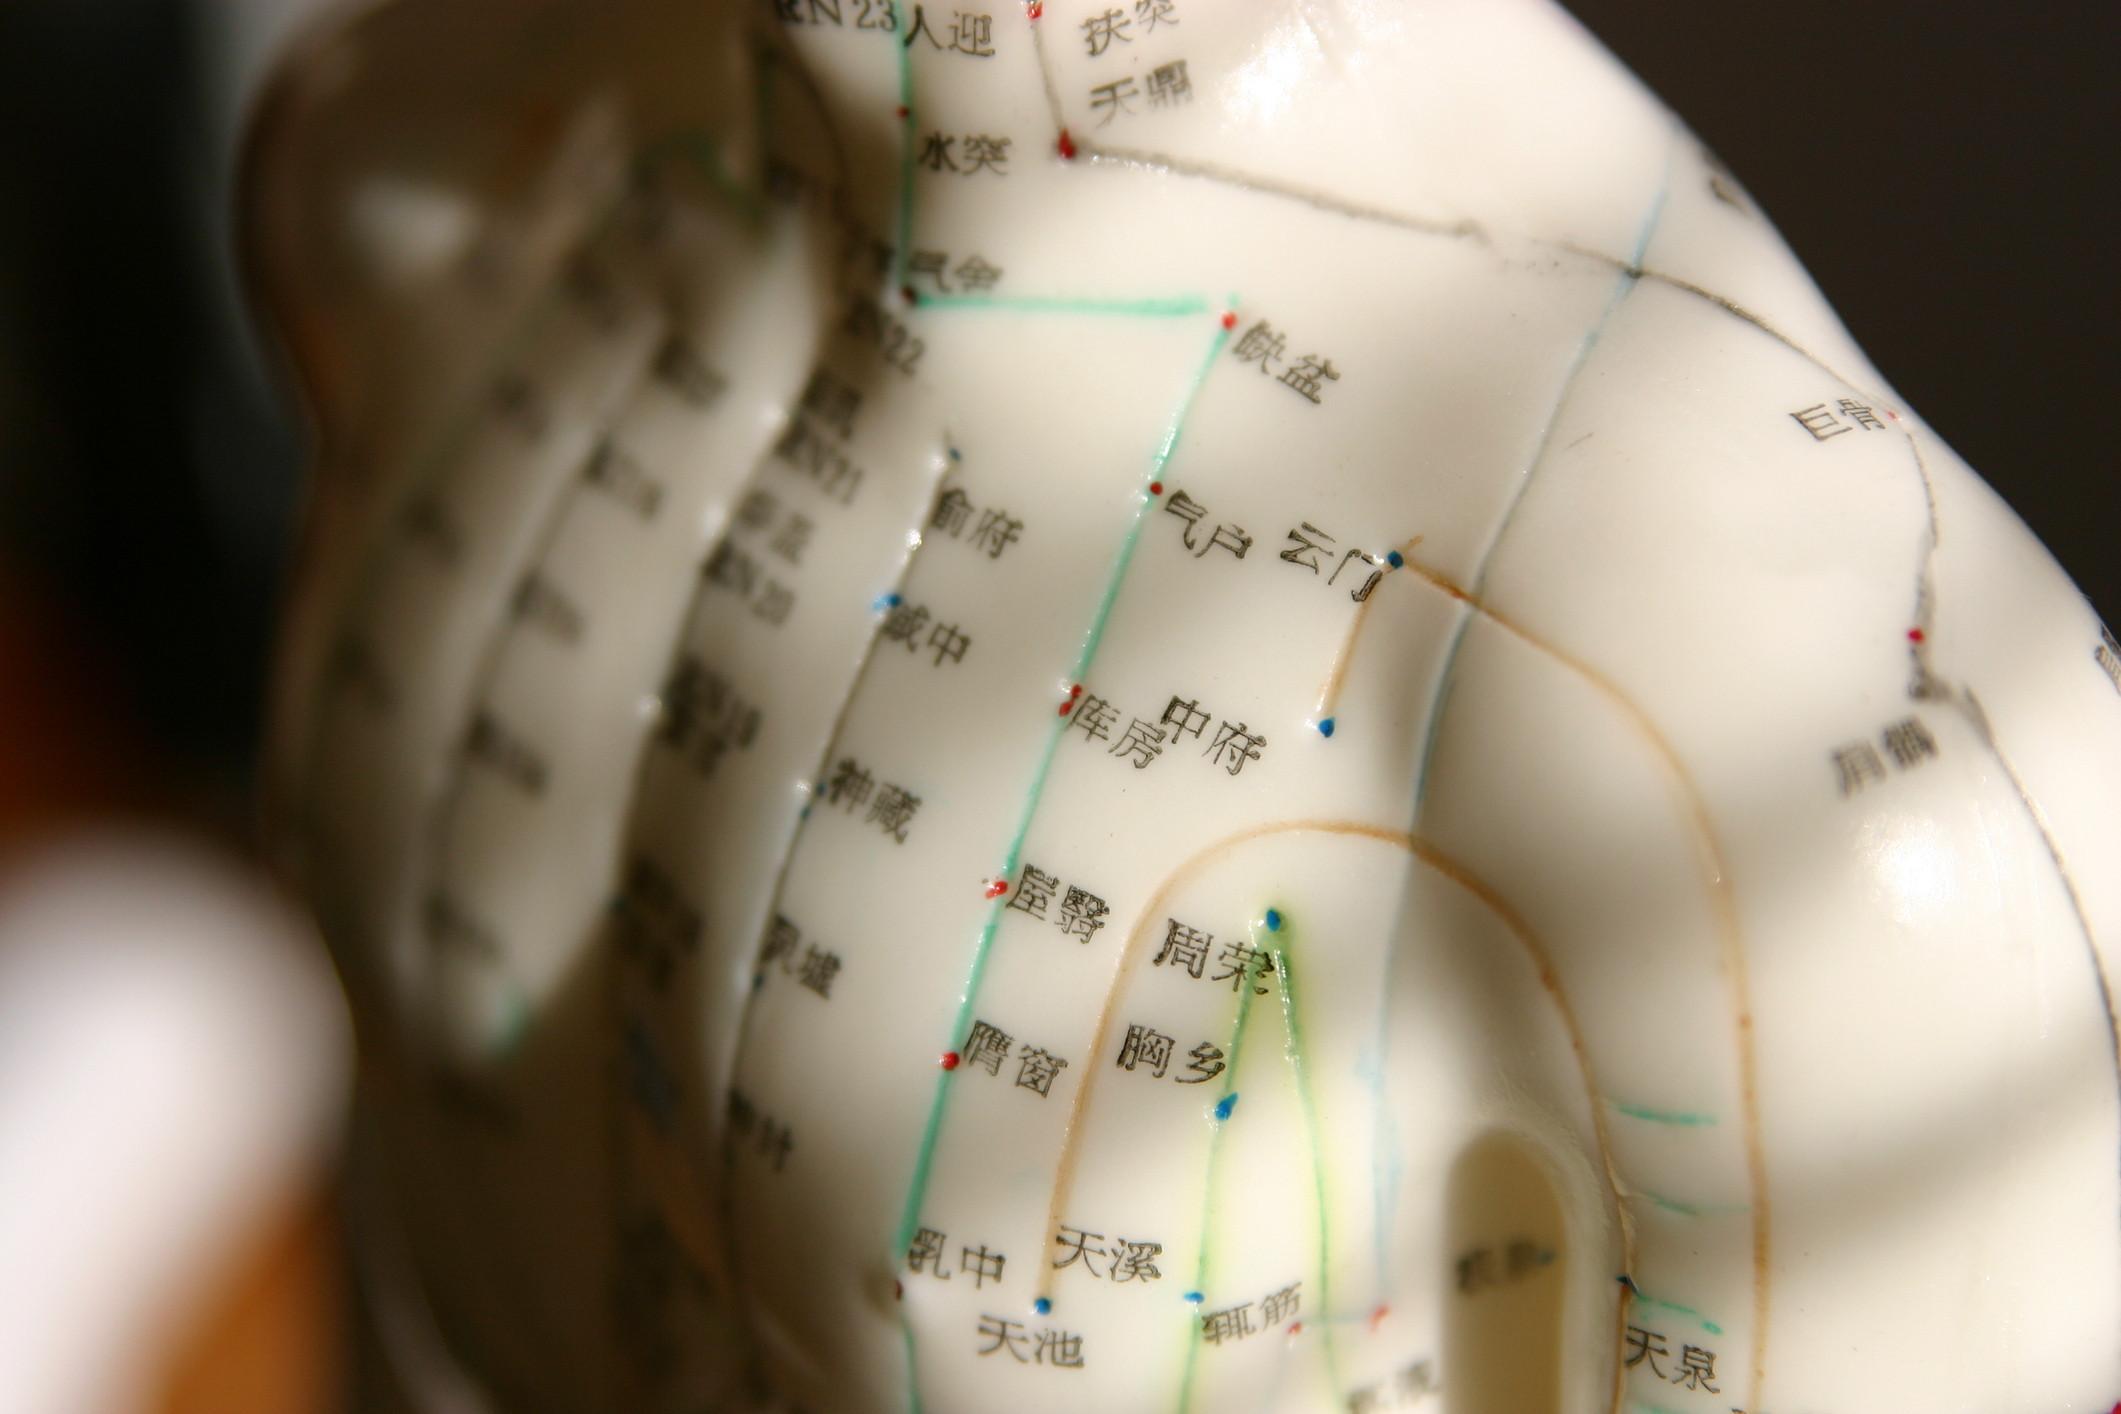 Acupuncture standard